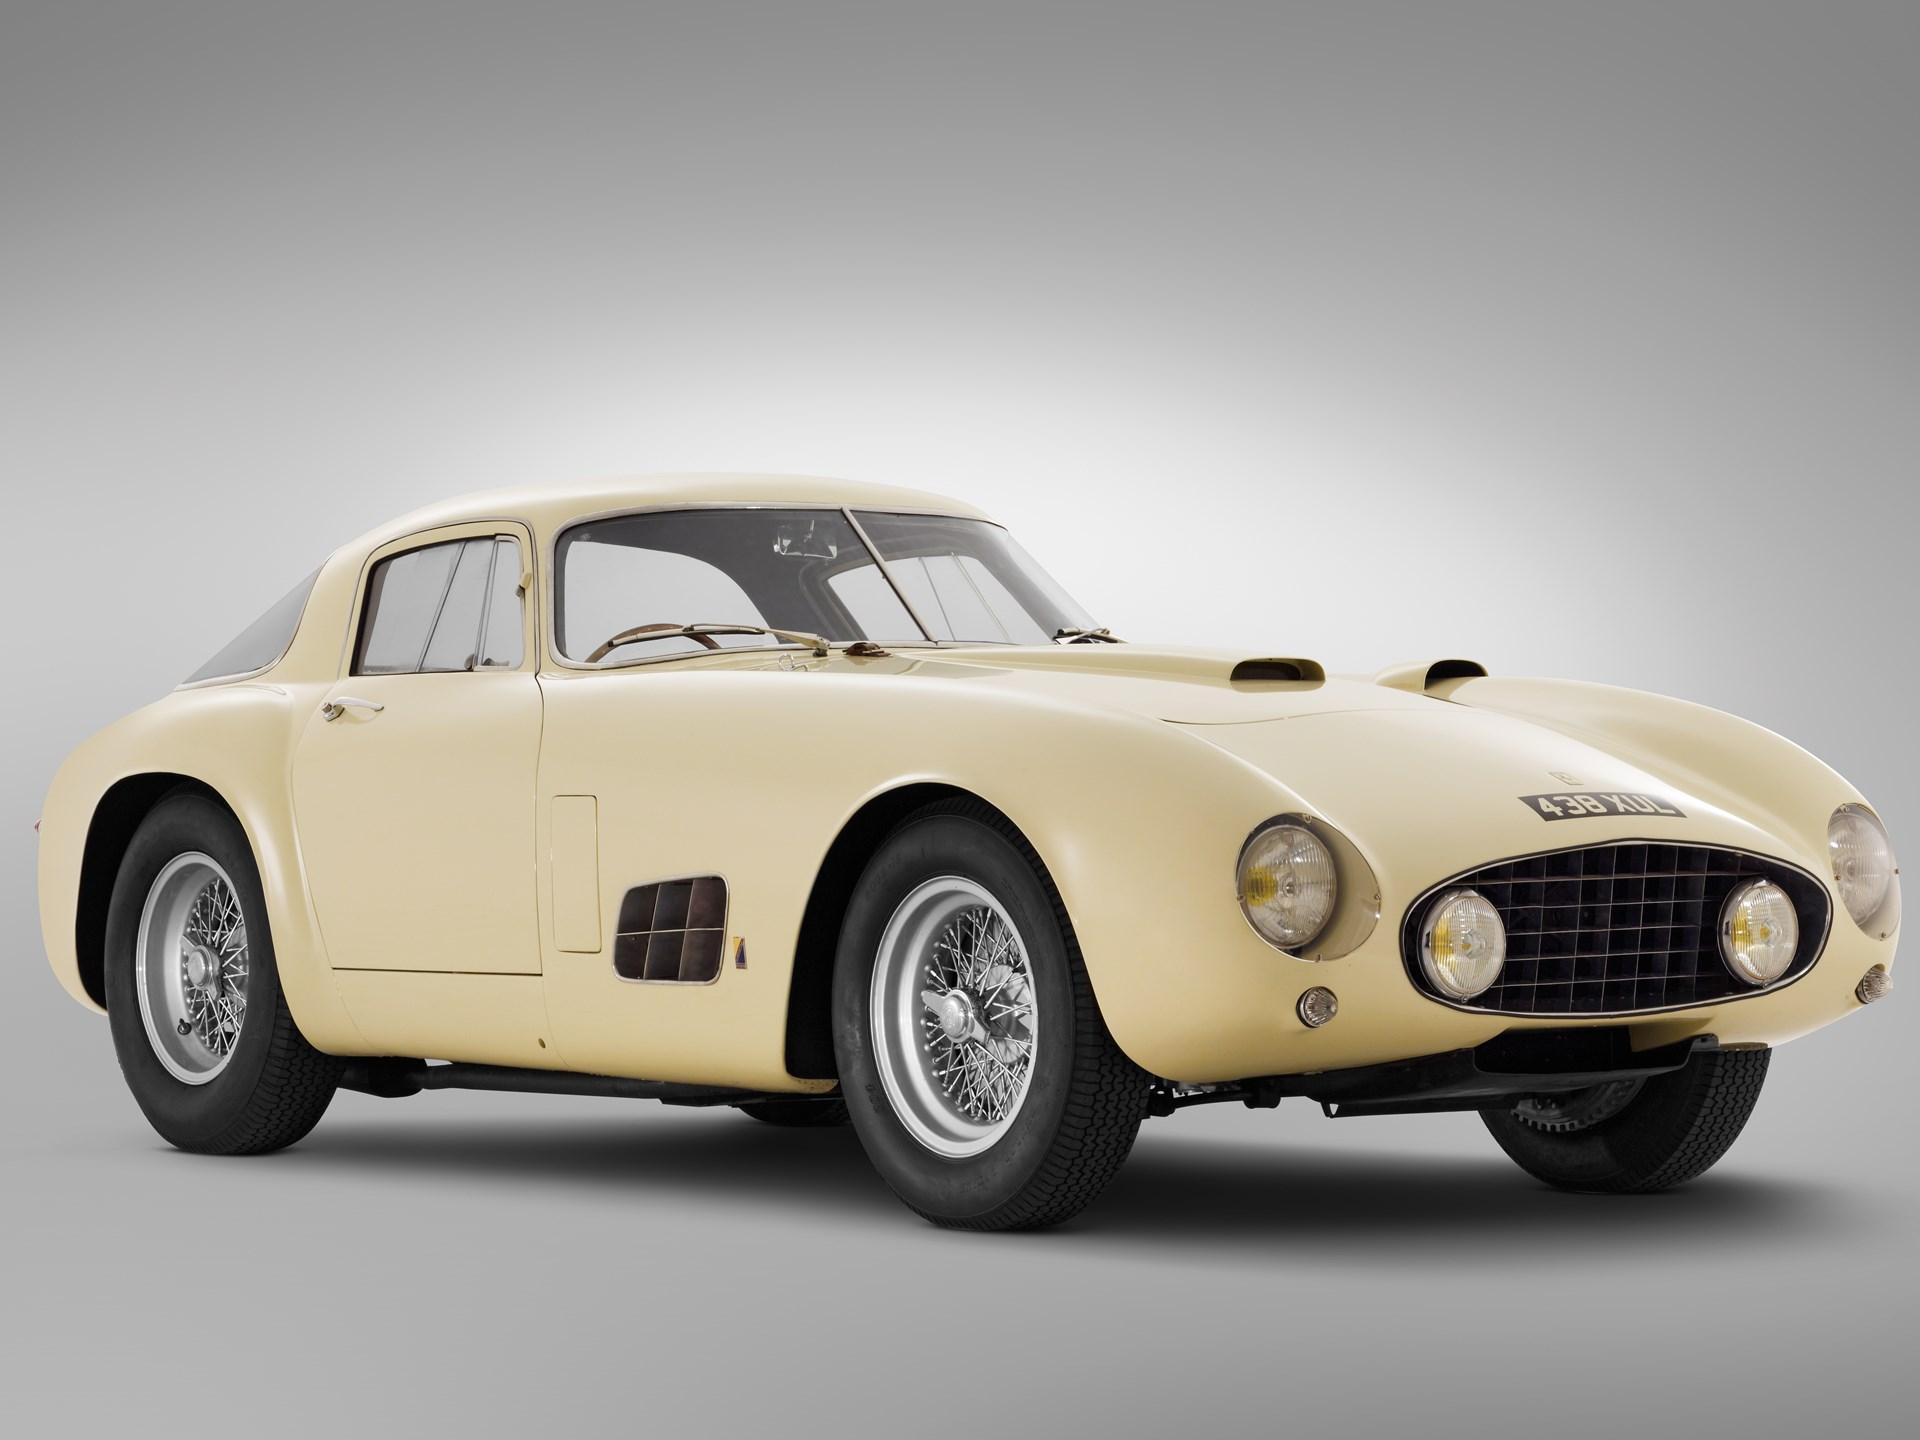 Ferrari – 410 S Berlinetta